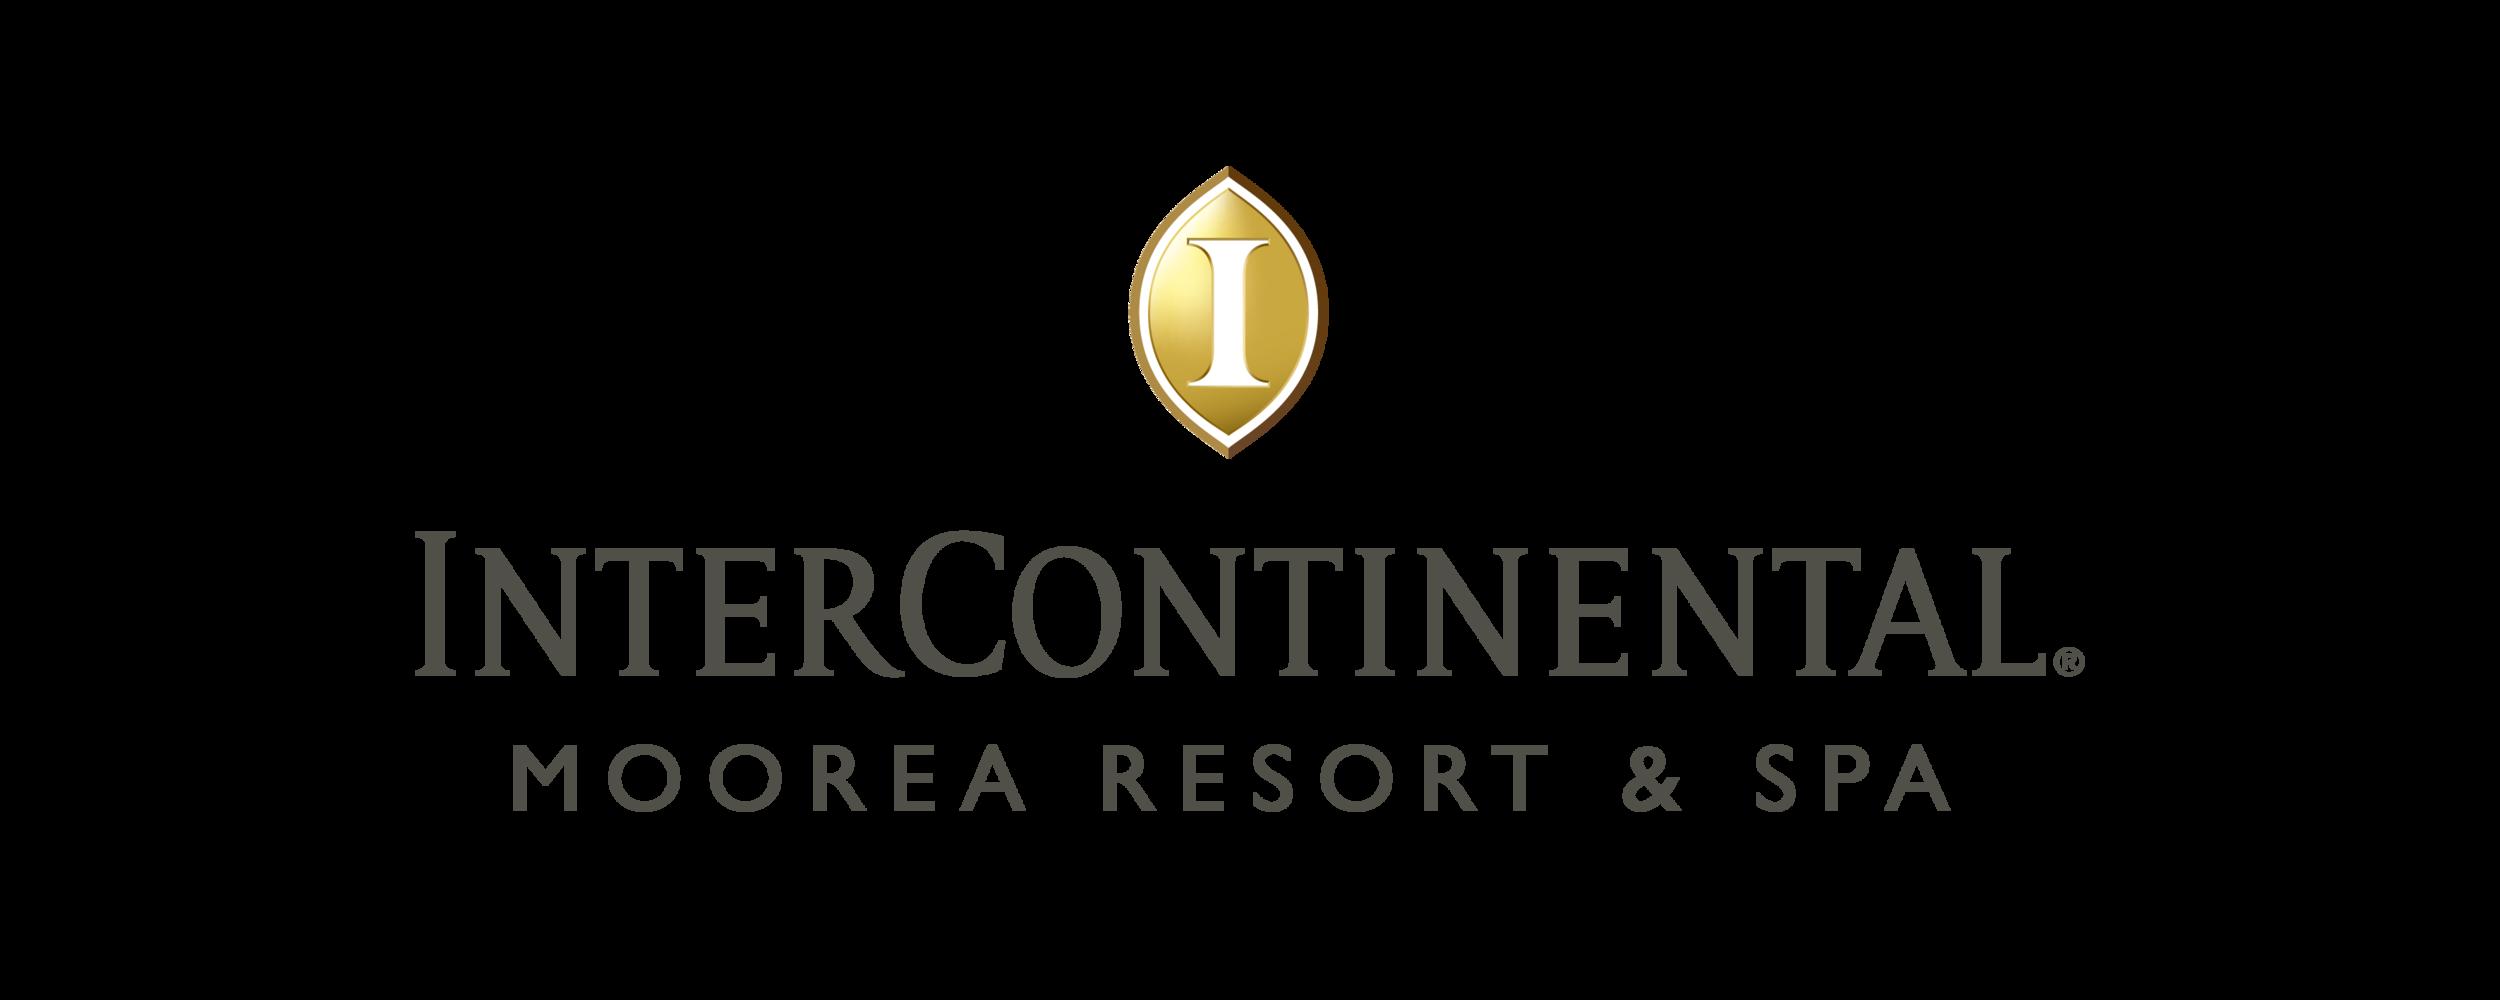 intercontinental-moorea-resort--spa_48004676033_o.png